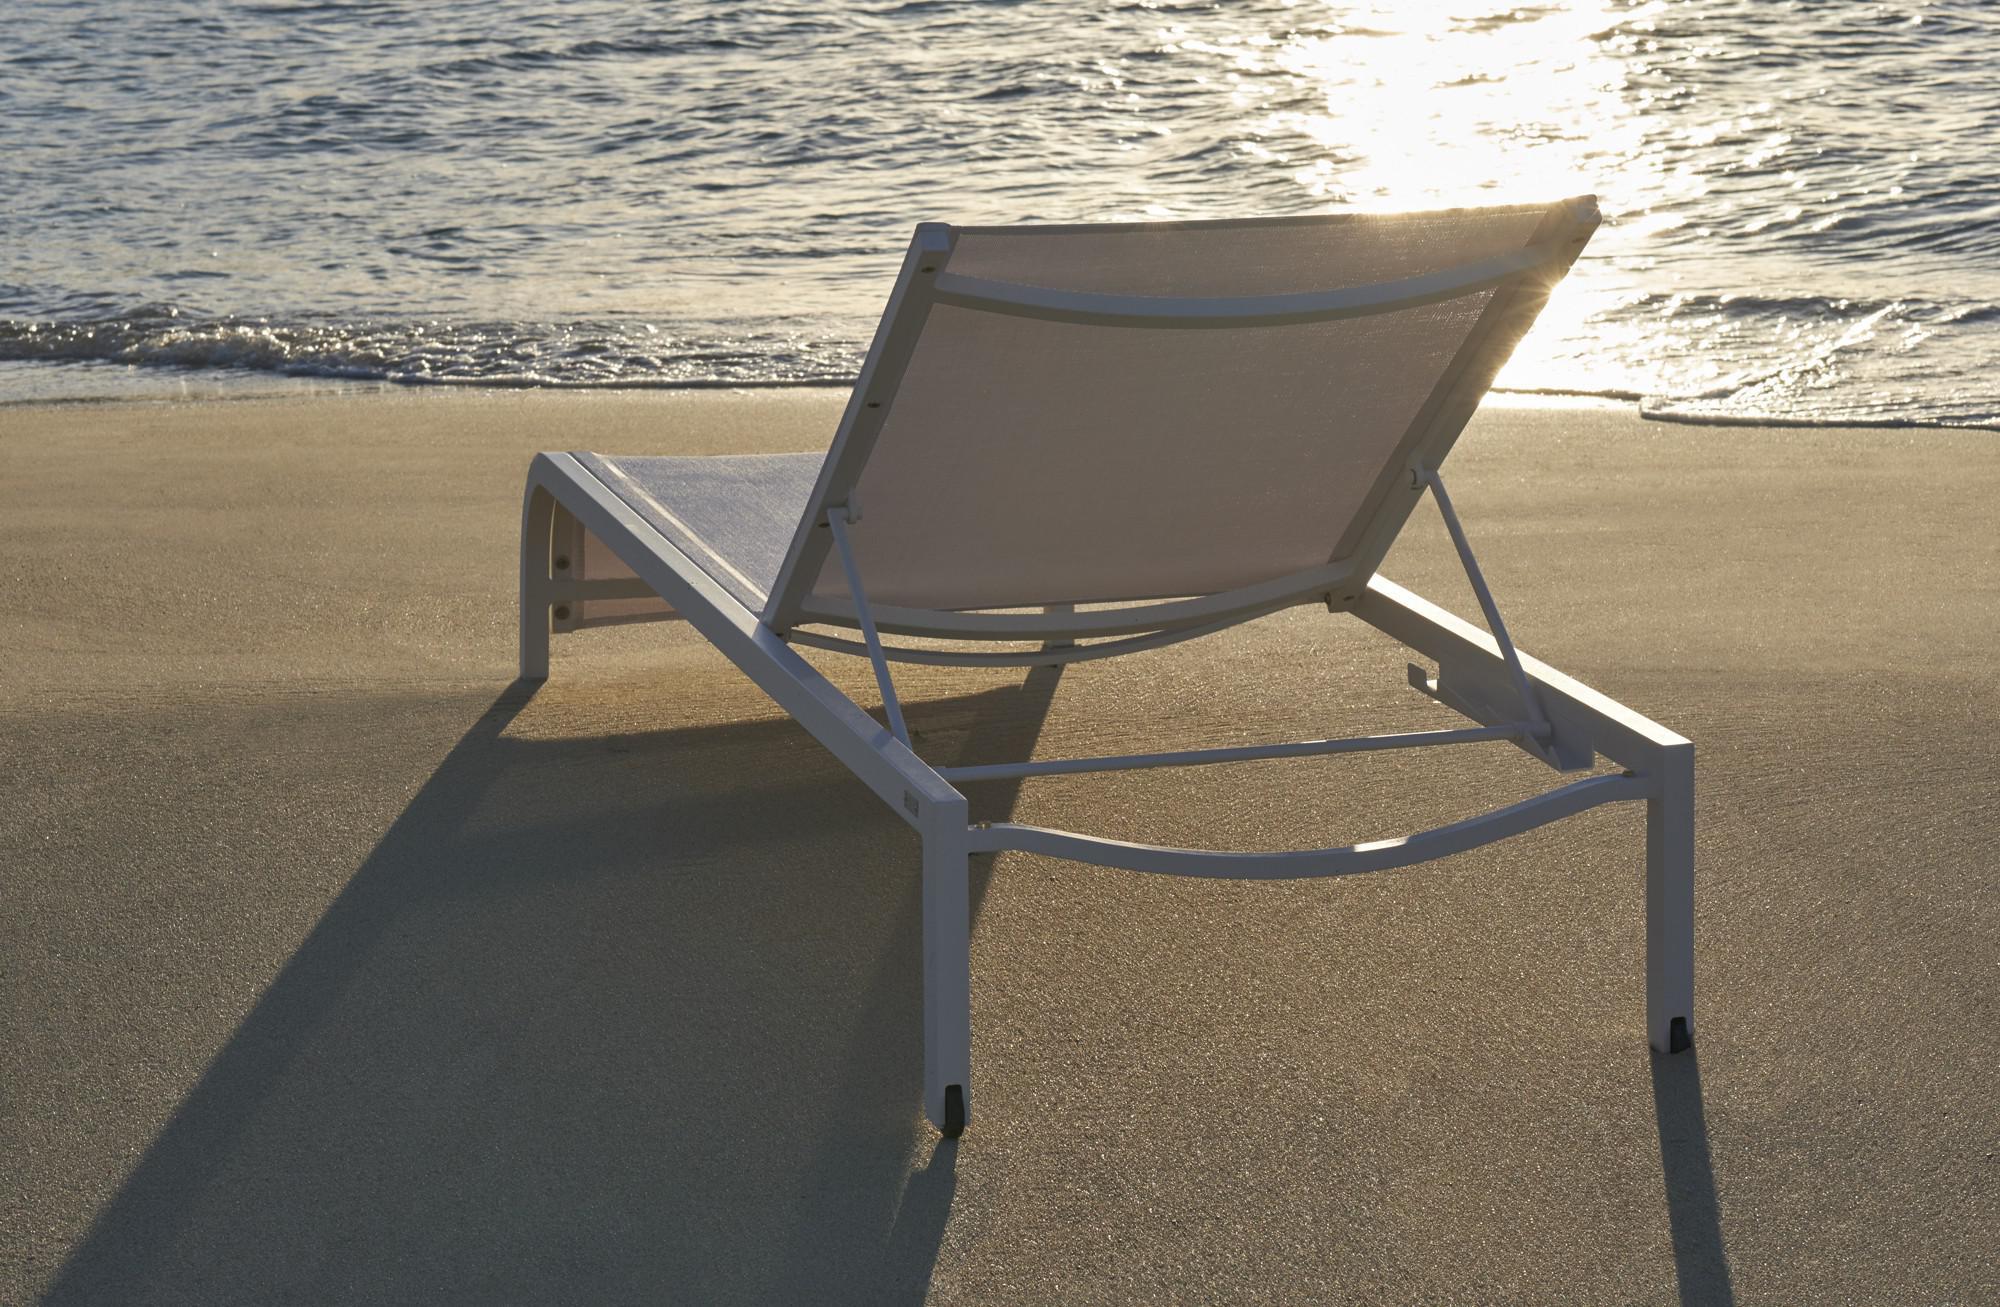 Latona beach lounger